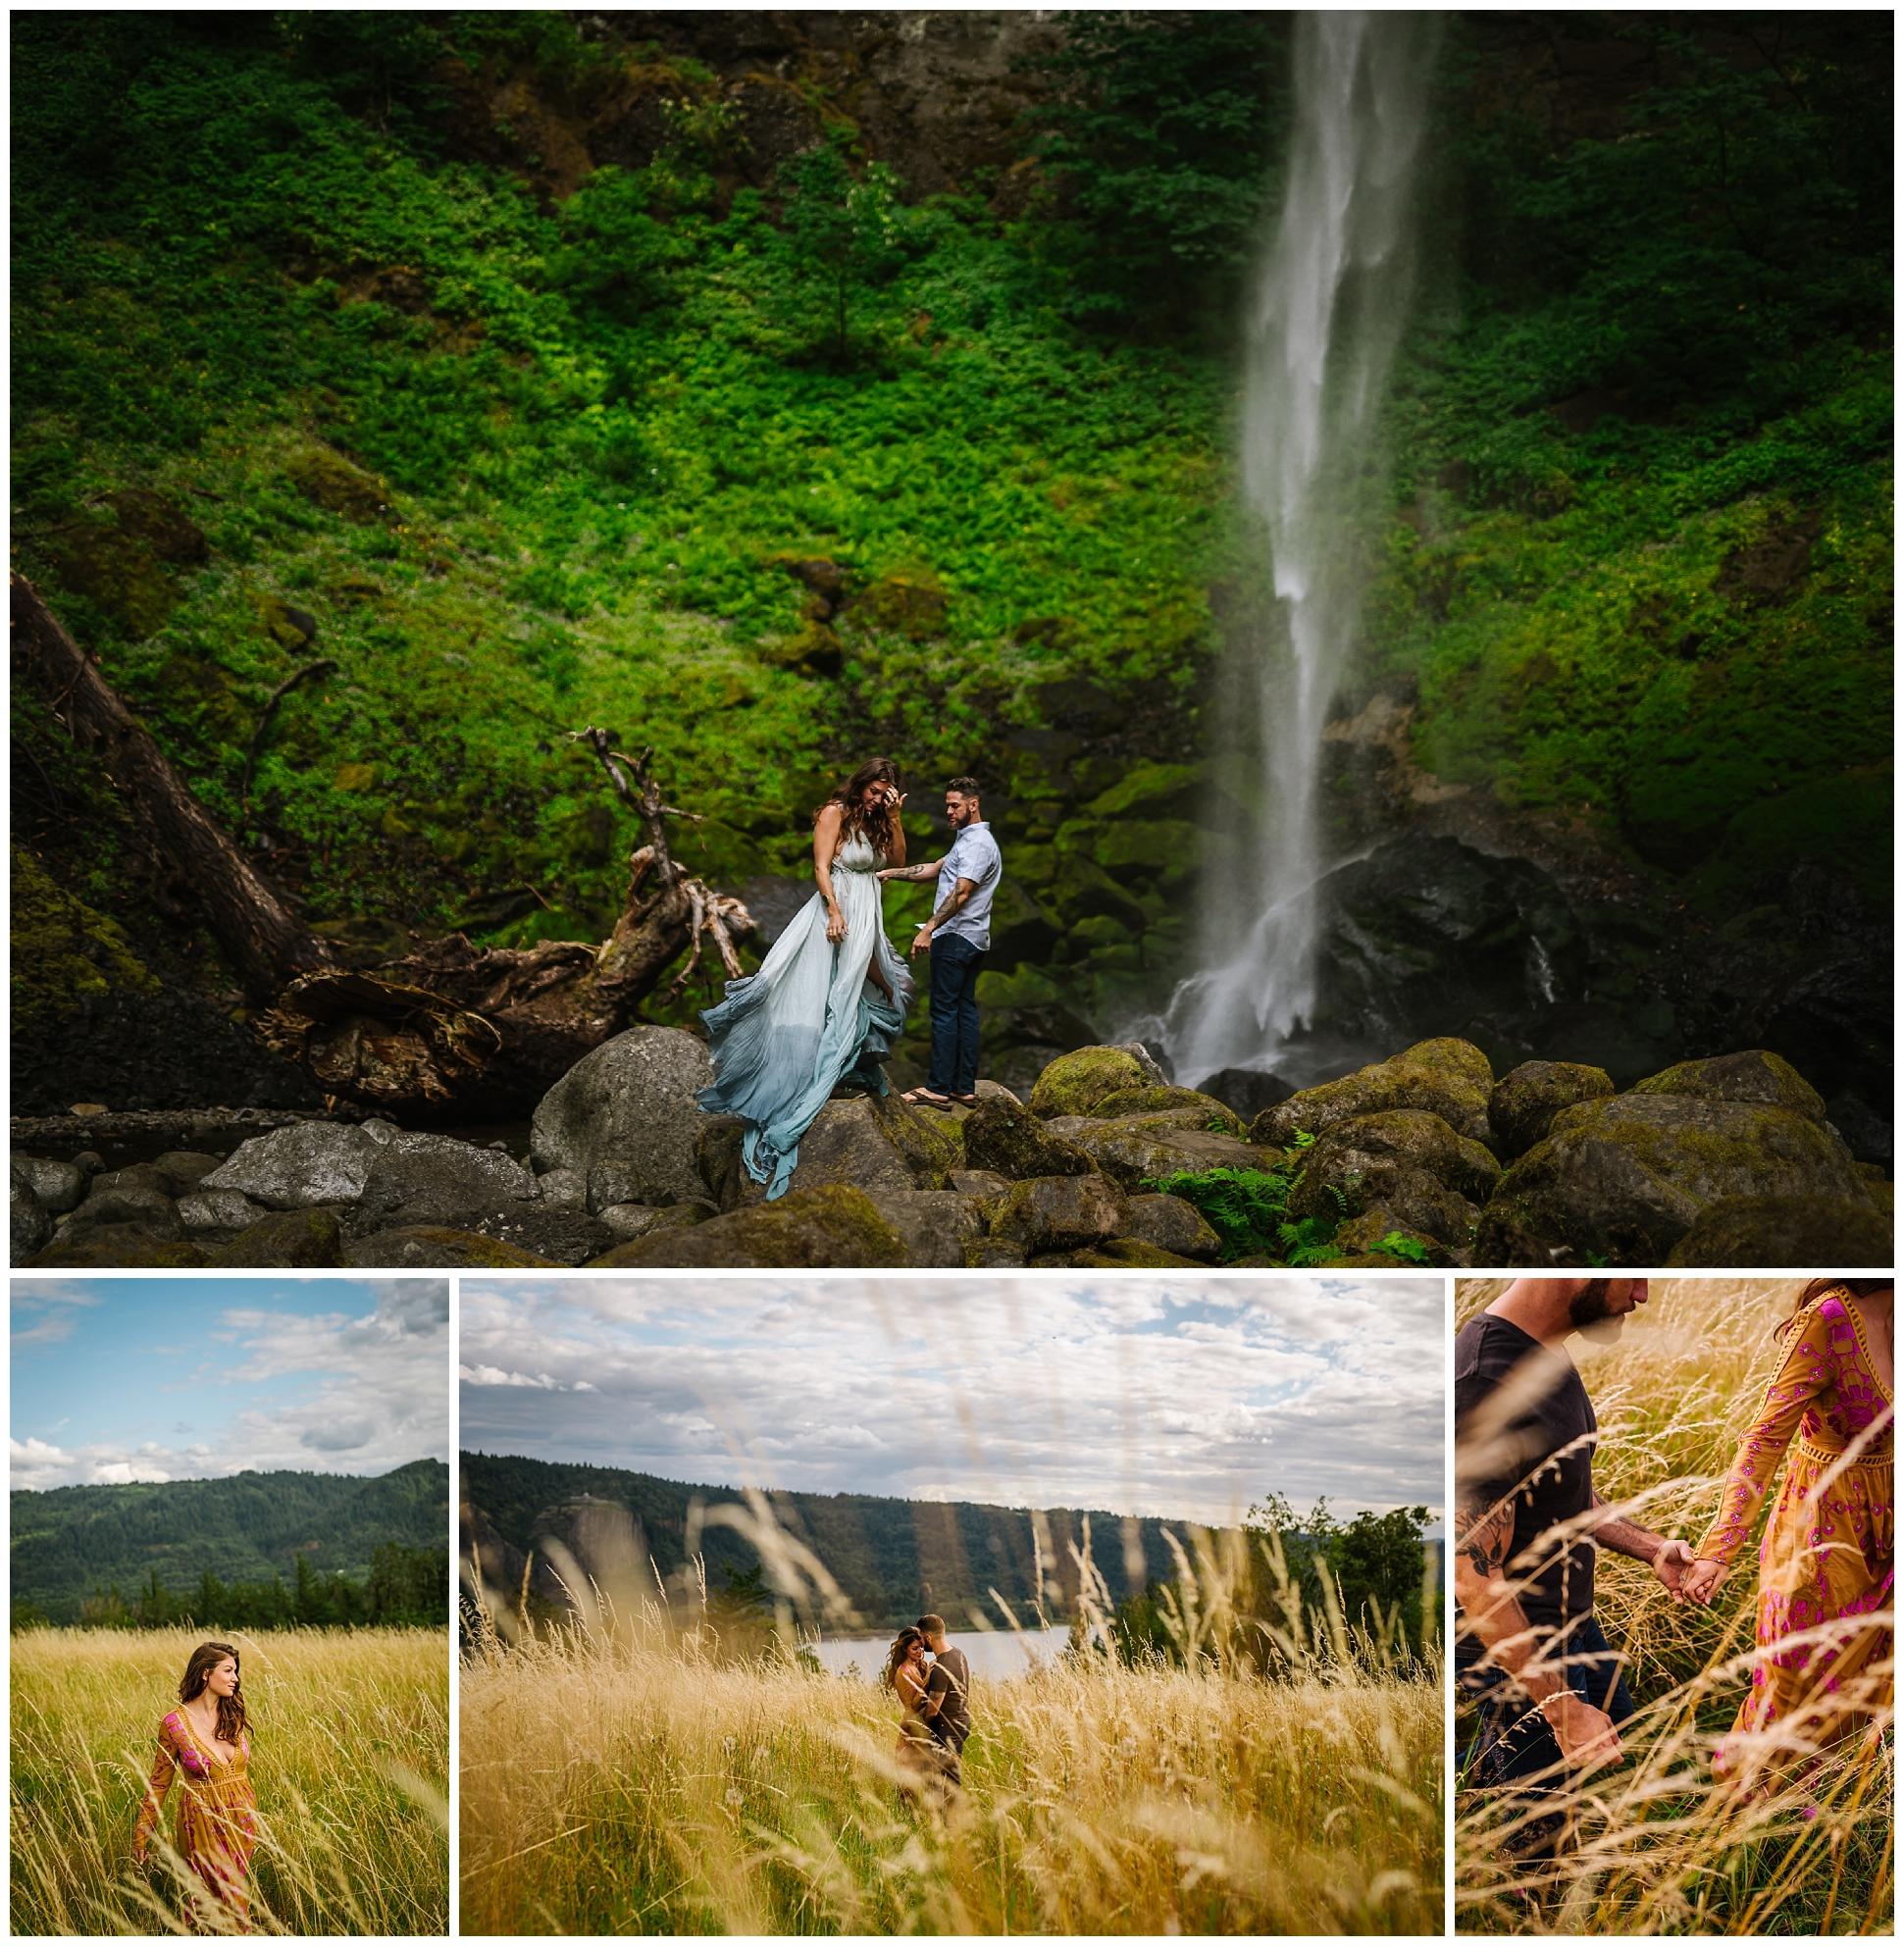 Ashlee-hamon-photography-year-in-review-2016-travel-wanderlust-vsco-adventure-wedding_0042.jpg